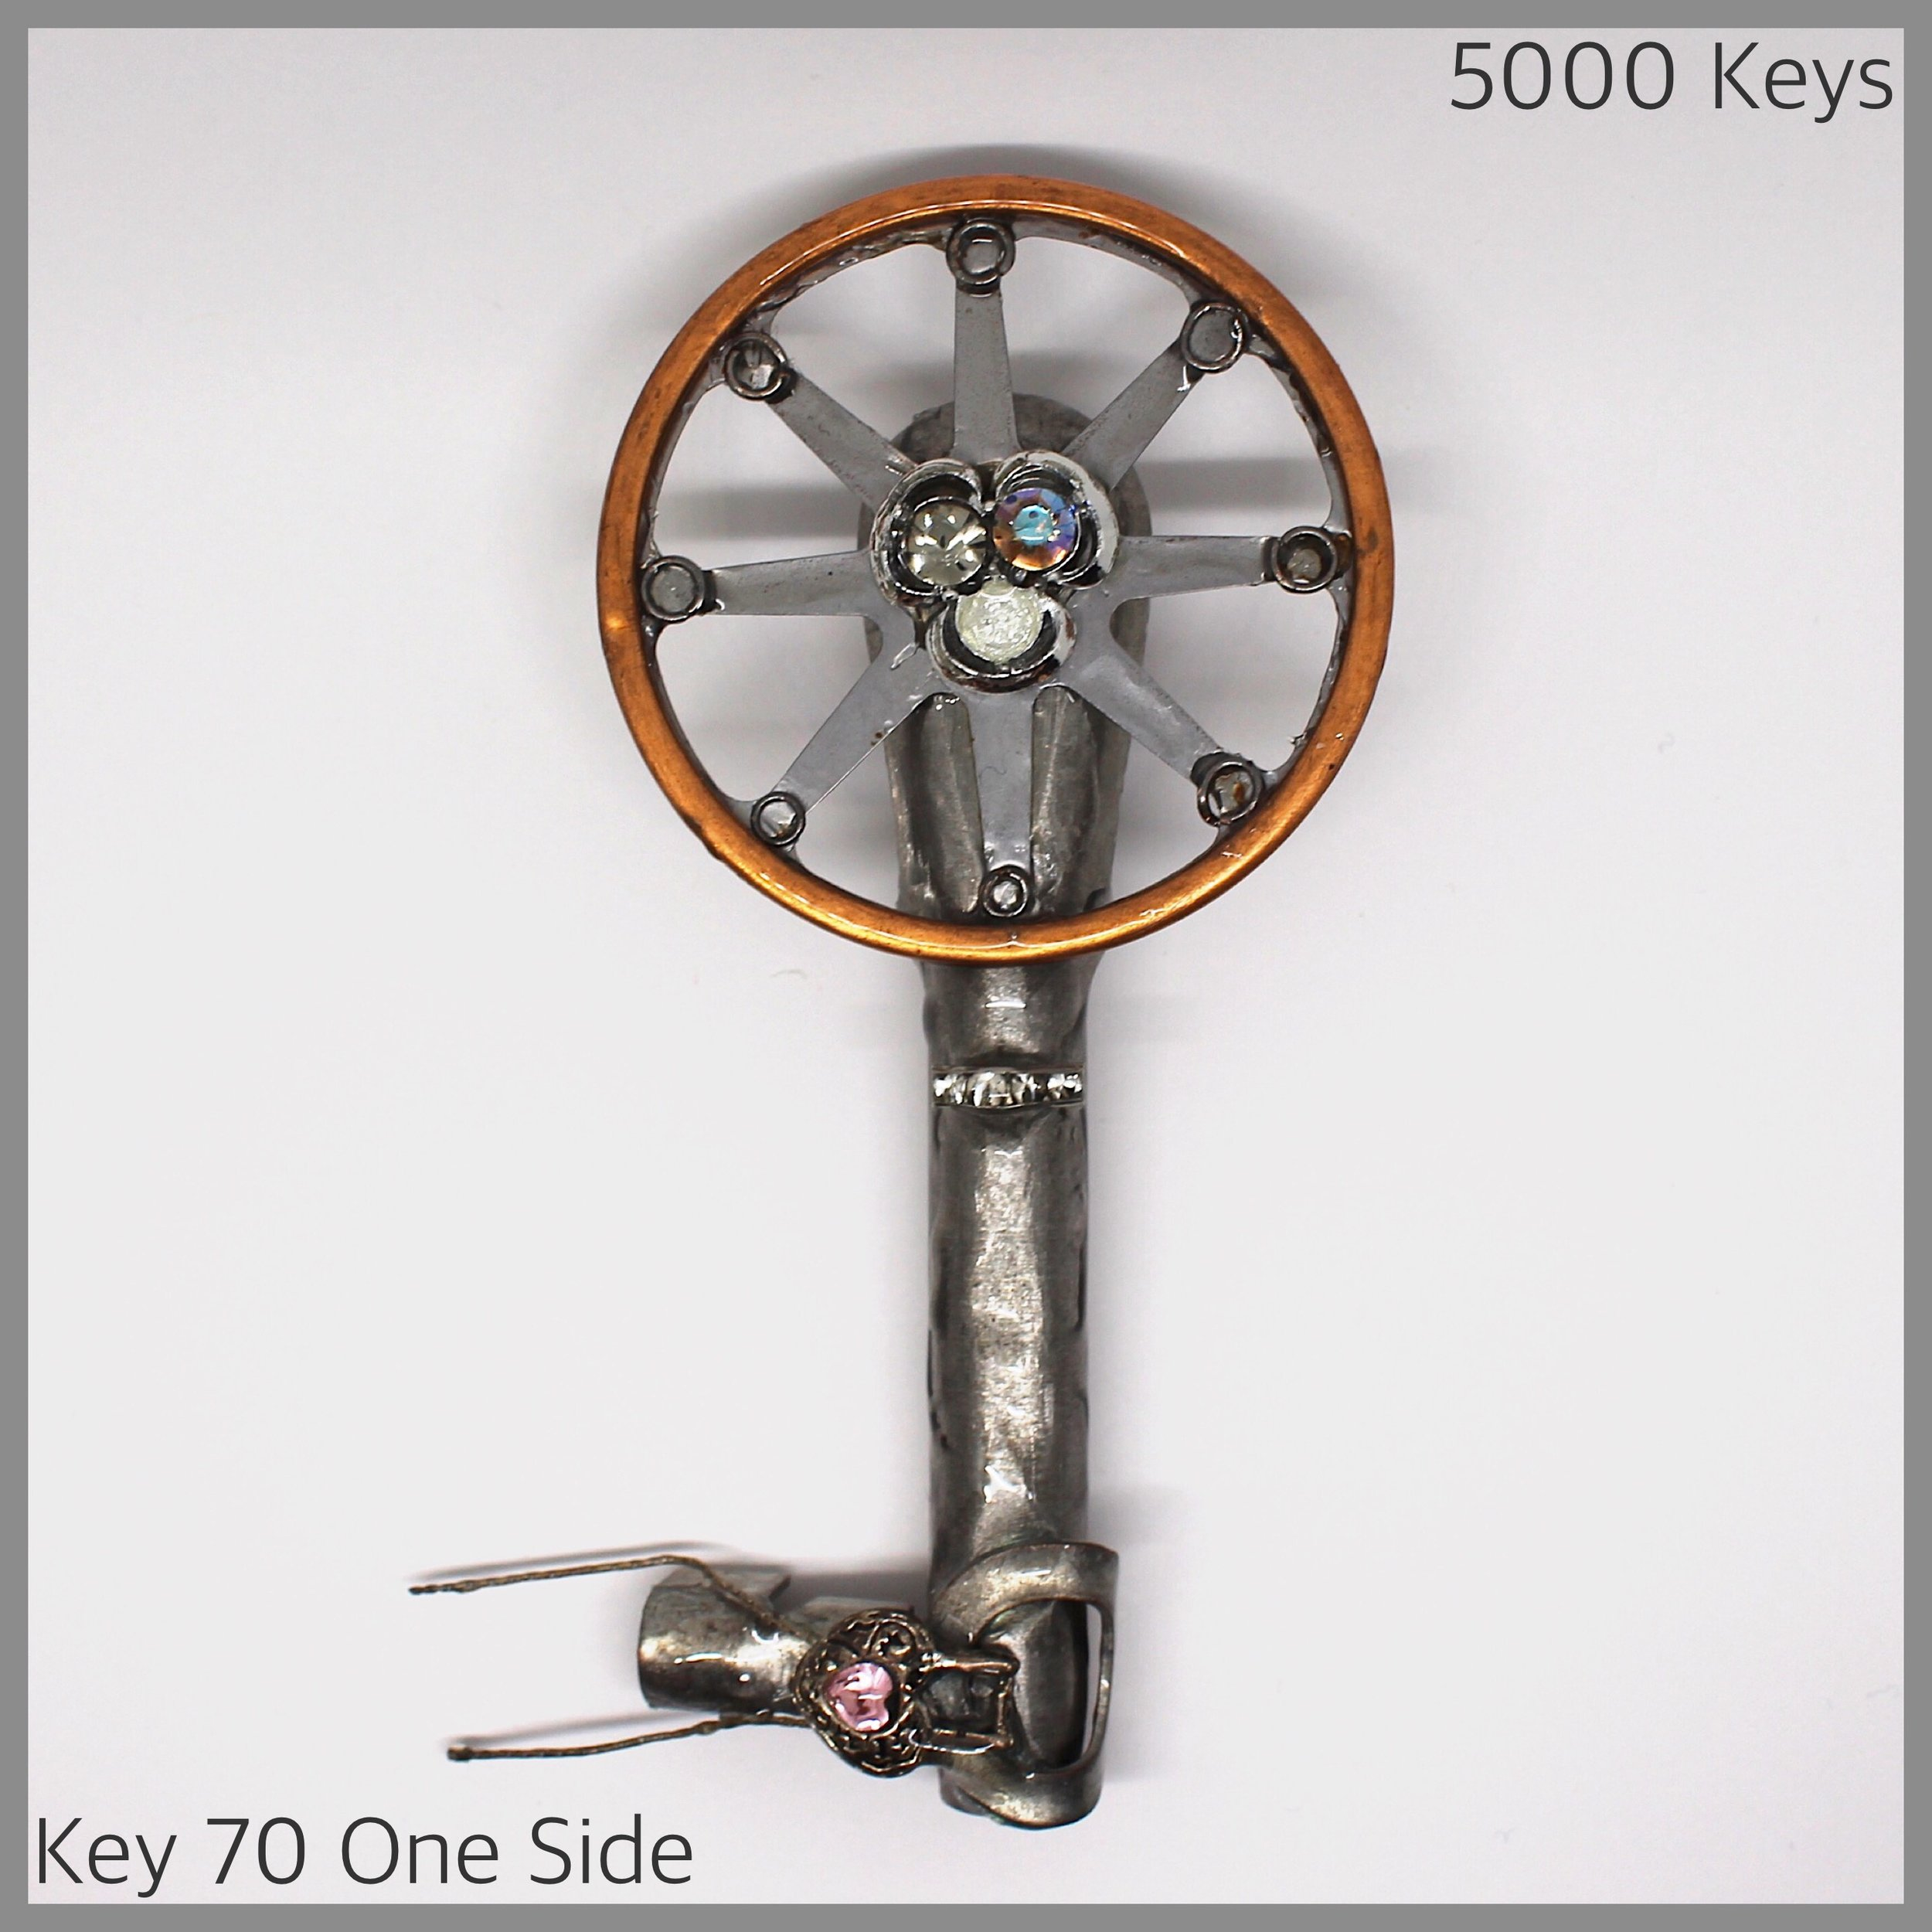 Key 70 one side - 1.JPG